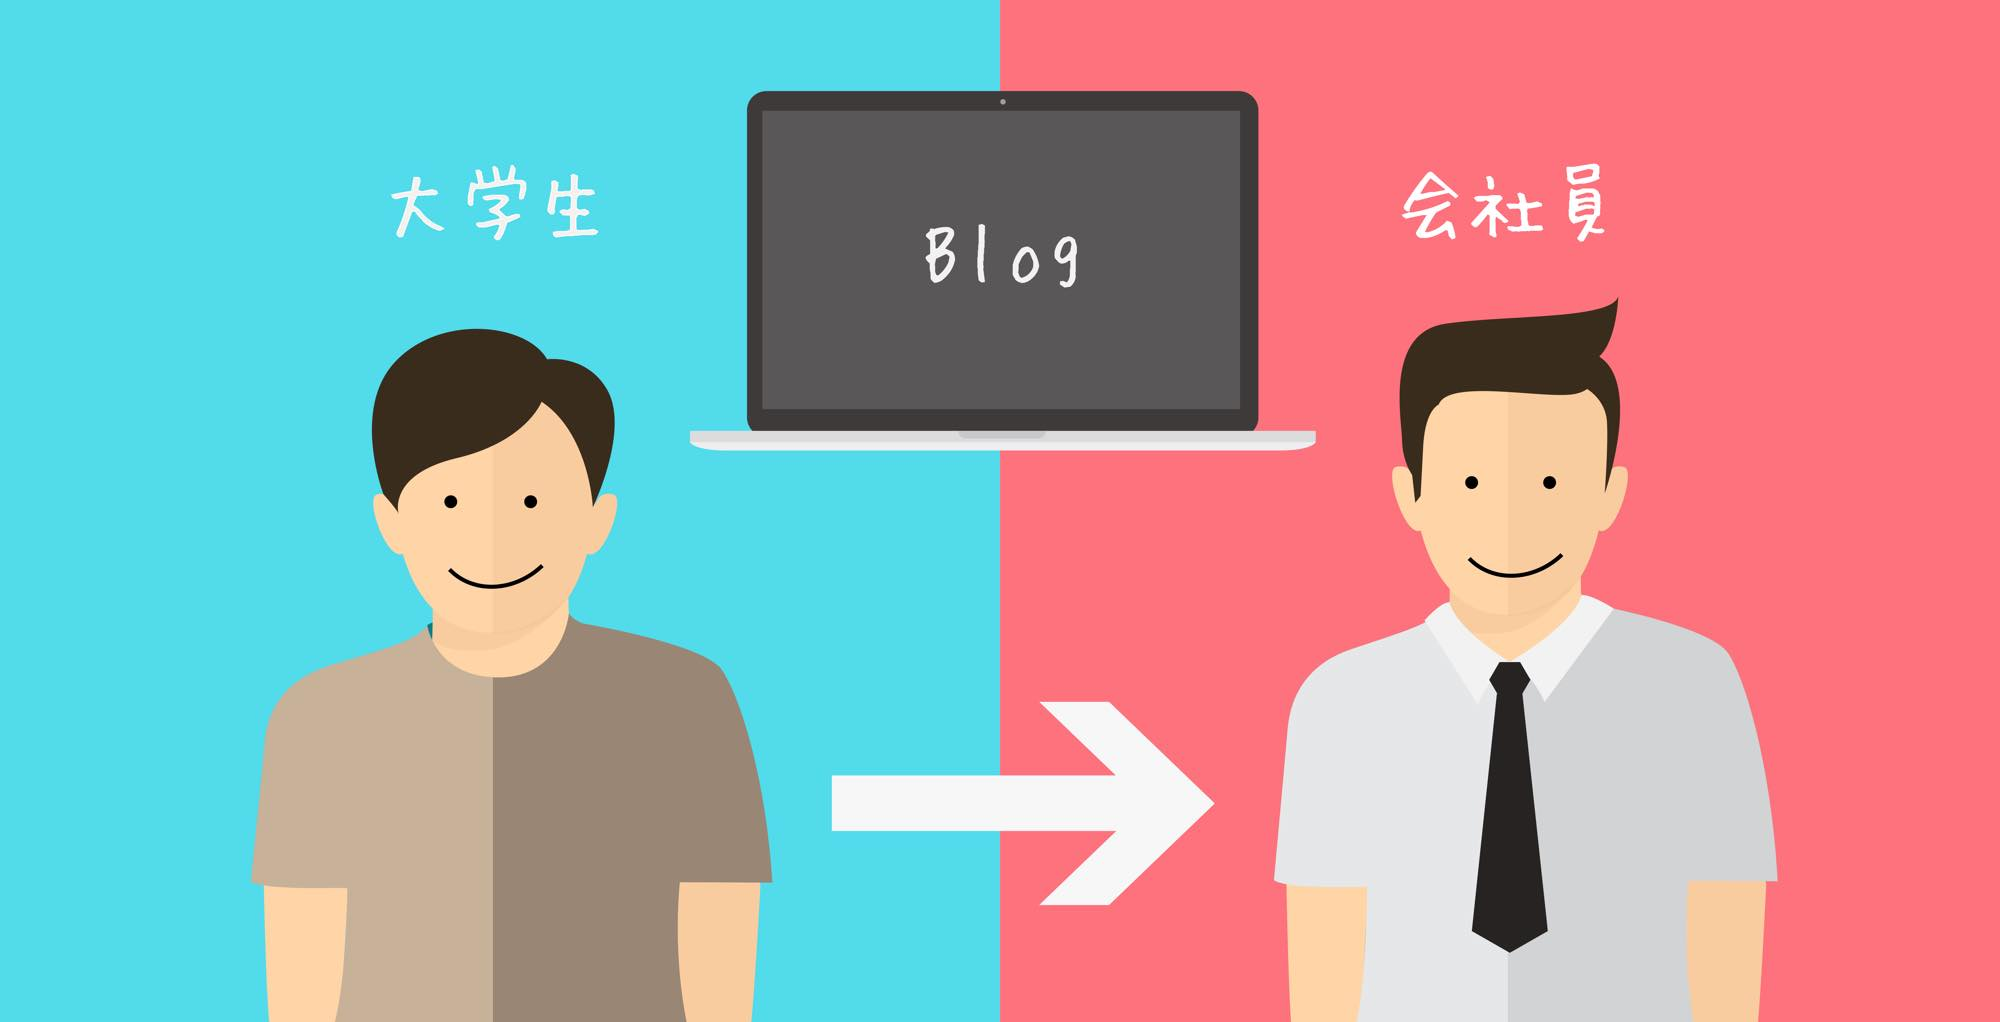 daigakusei-shakaizn-blog